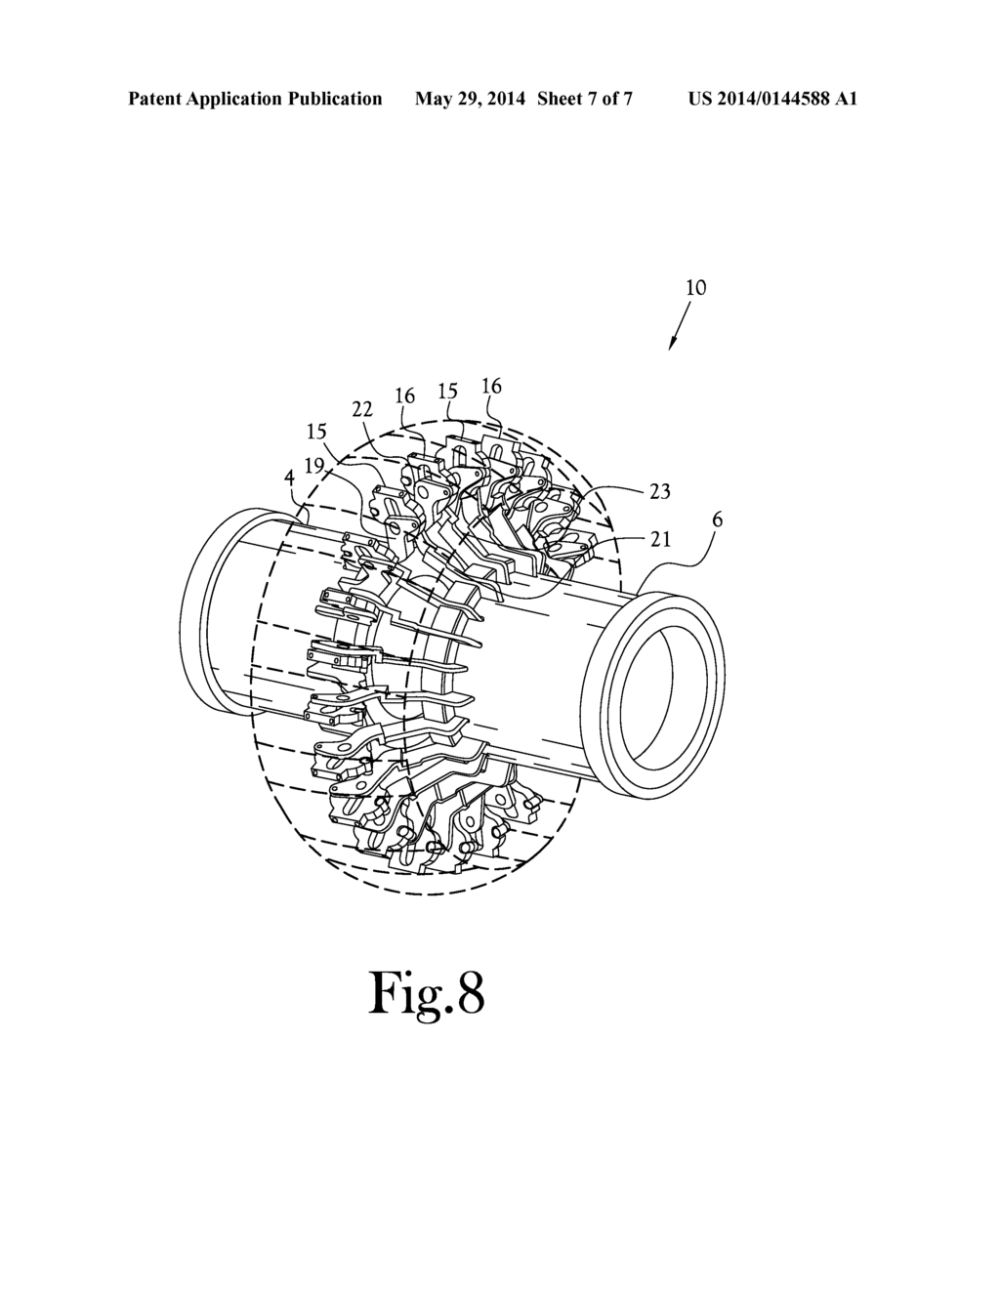 medium resolution of tire building drum having sequenced segment expansion diagram schematic and image 08